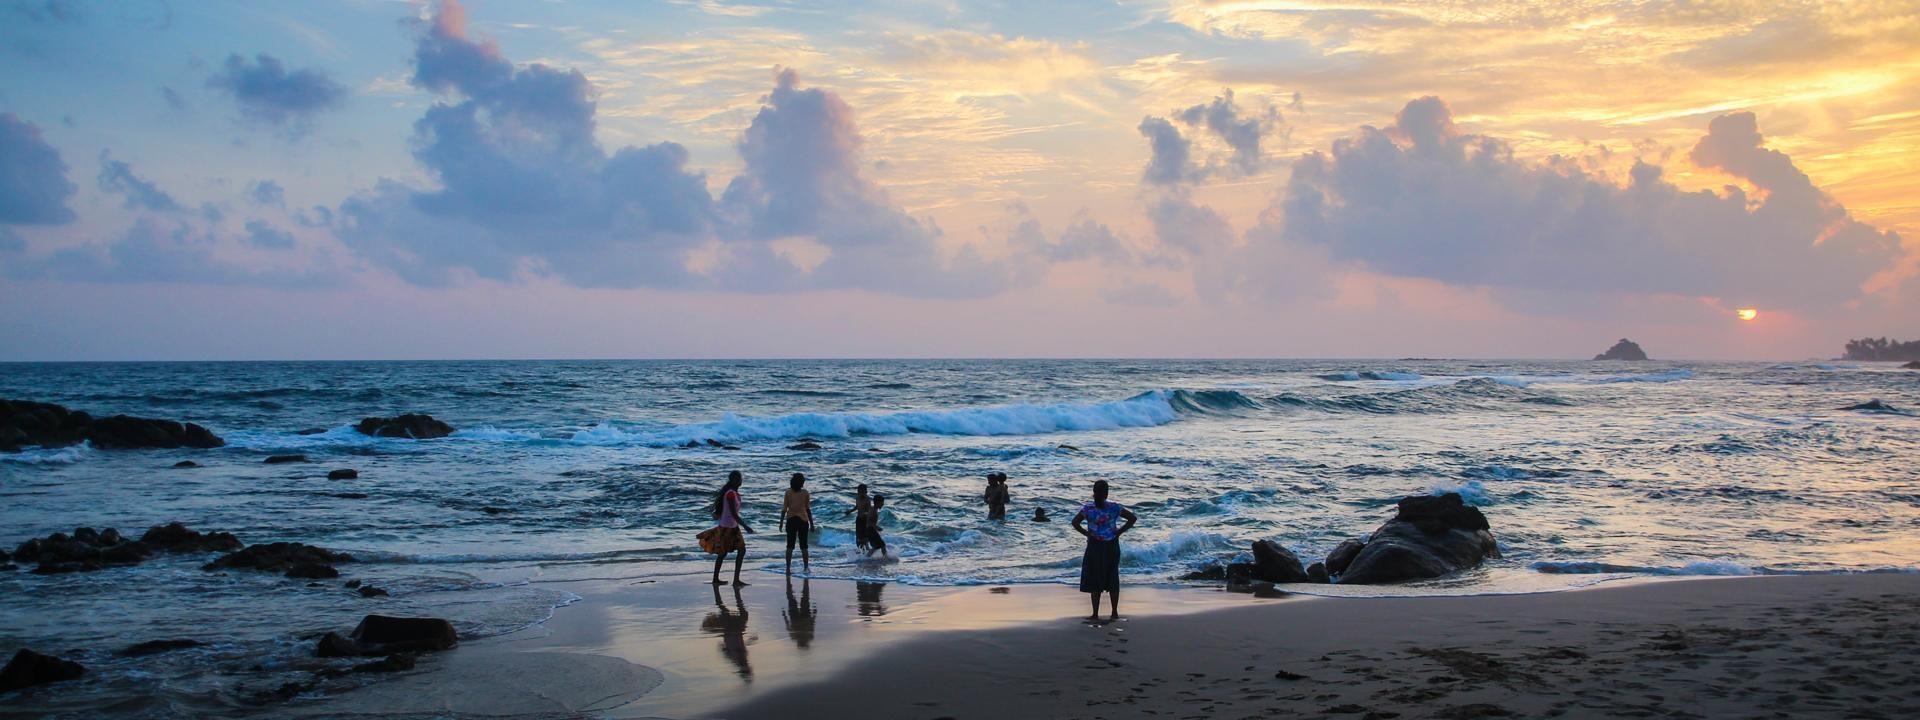 @natasasilec Midigama beach